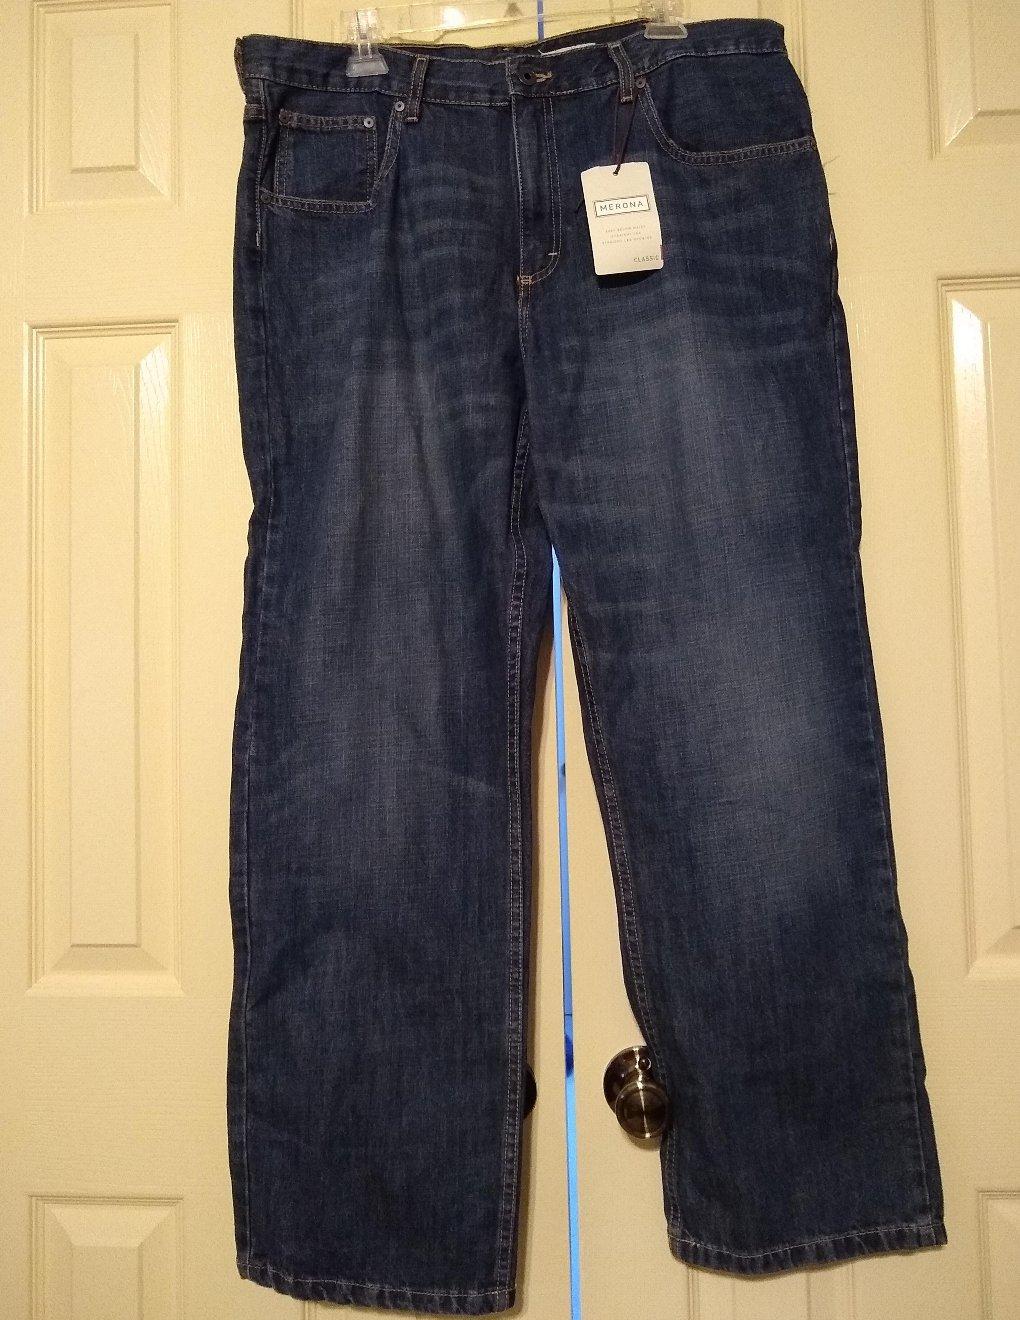 Mens CLASSIC Merona Brand 5 Pocket Jeans Dark Wash 38 x 30 100% Cotton NEW